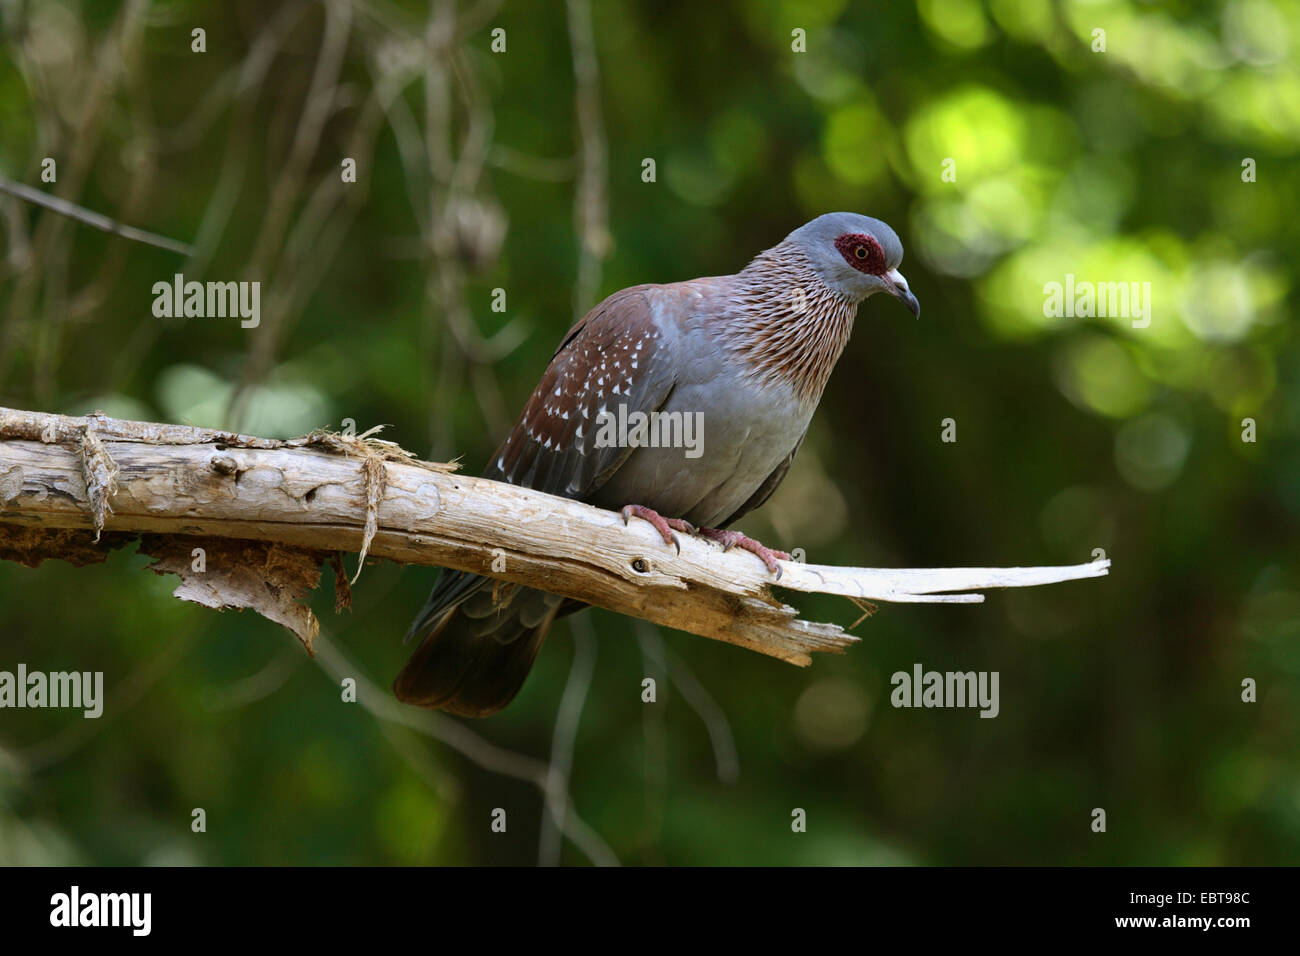 speckled pigeon (Columba guinea), sitting on a branch, Kenya, Samburu National Reserve - Stock Image